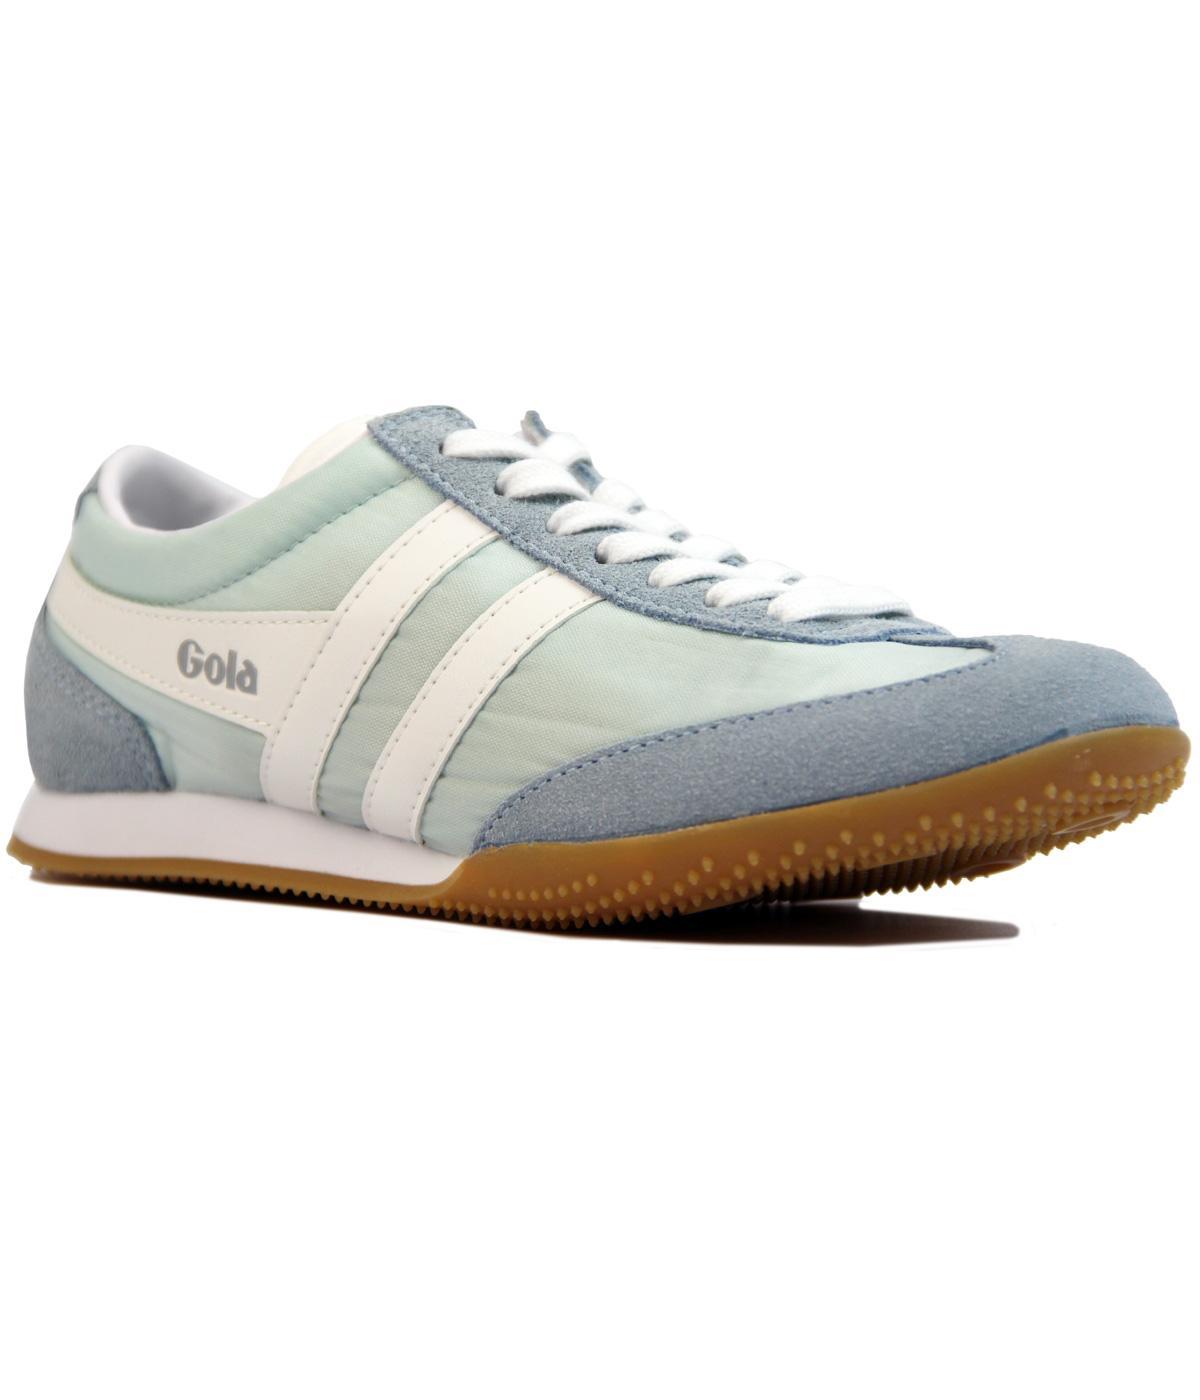 GOLA Wasp Womens Retro Nylon Suede Trainers BLUE